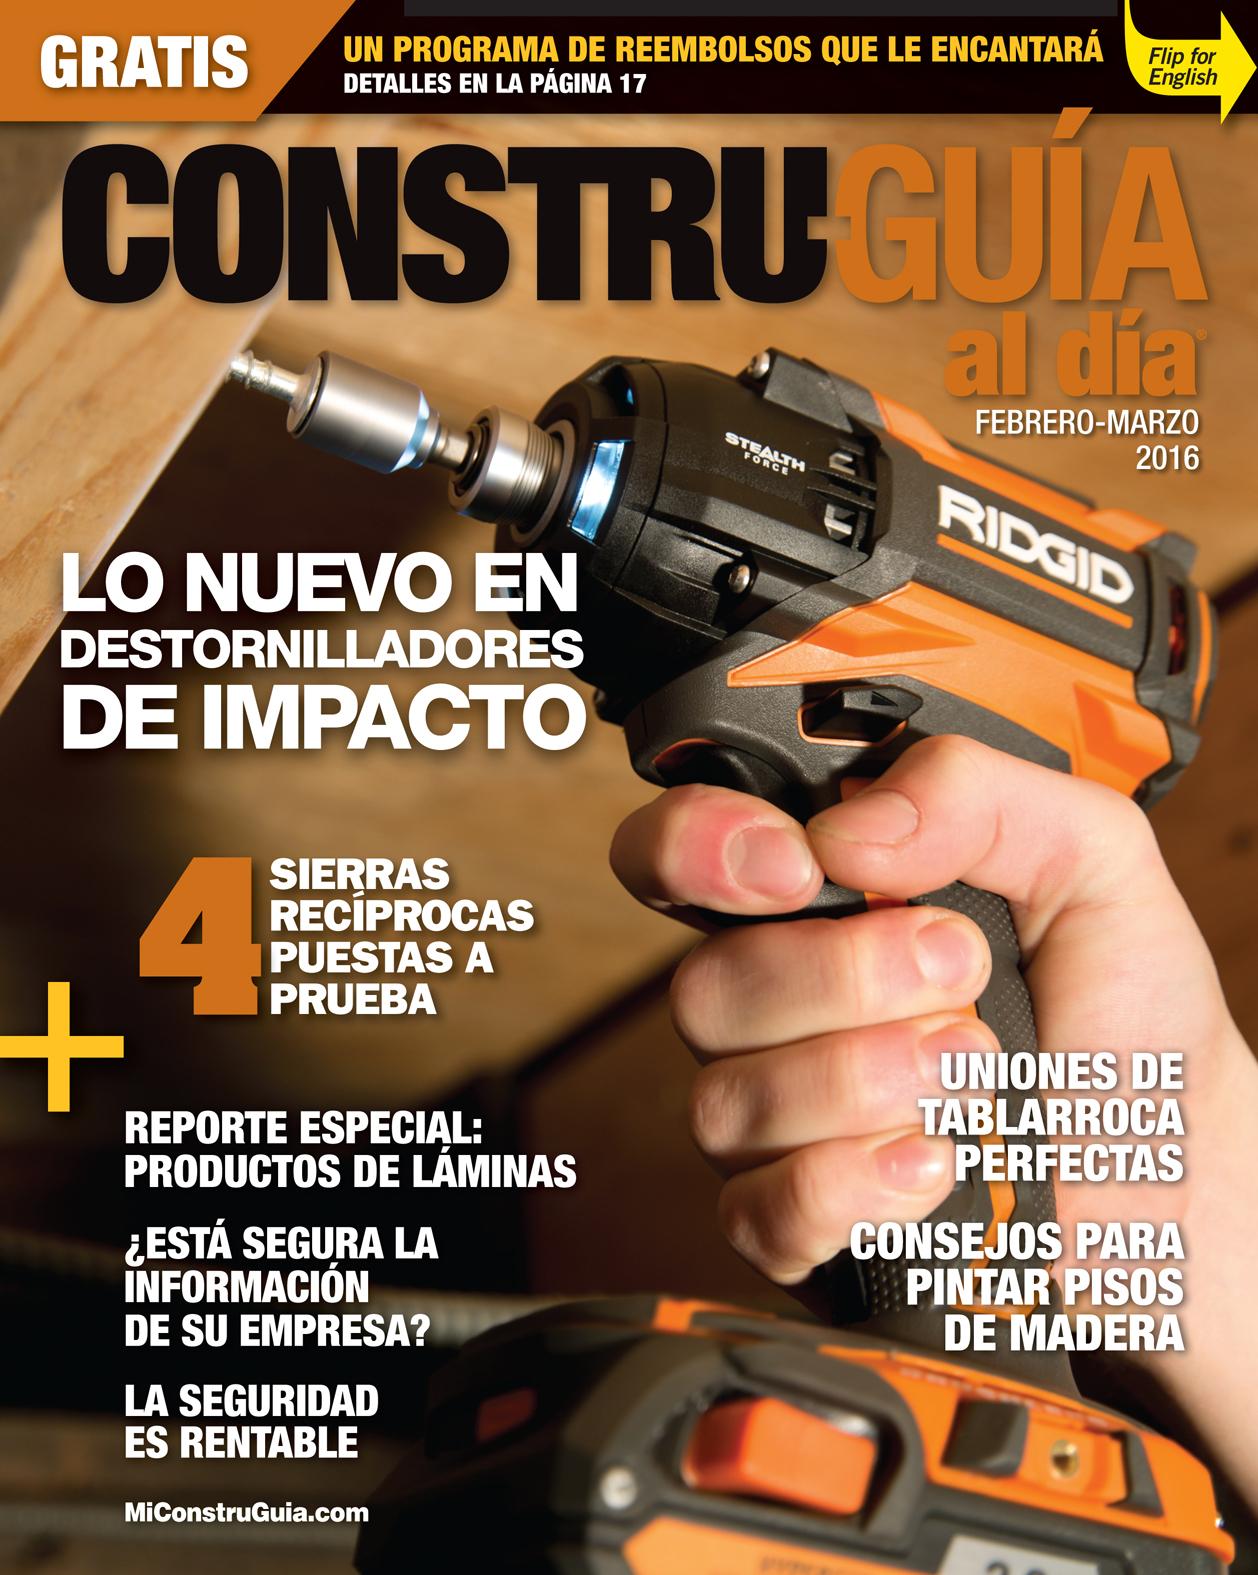 FEB-MAR2016_Cover_Spanish.indd